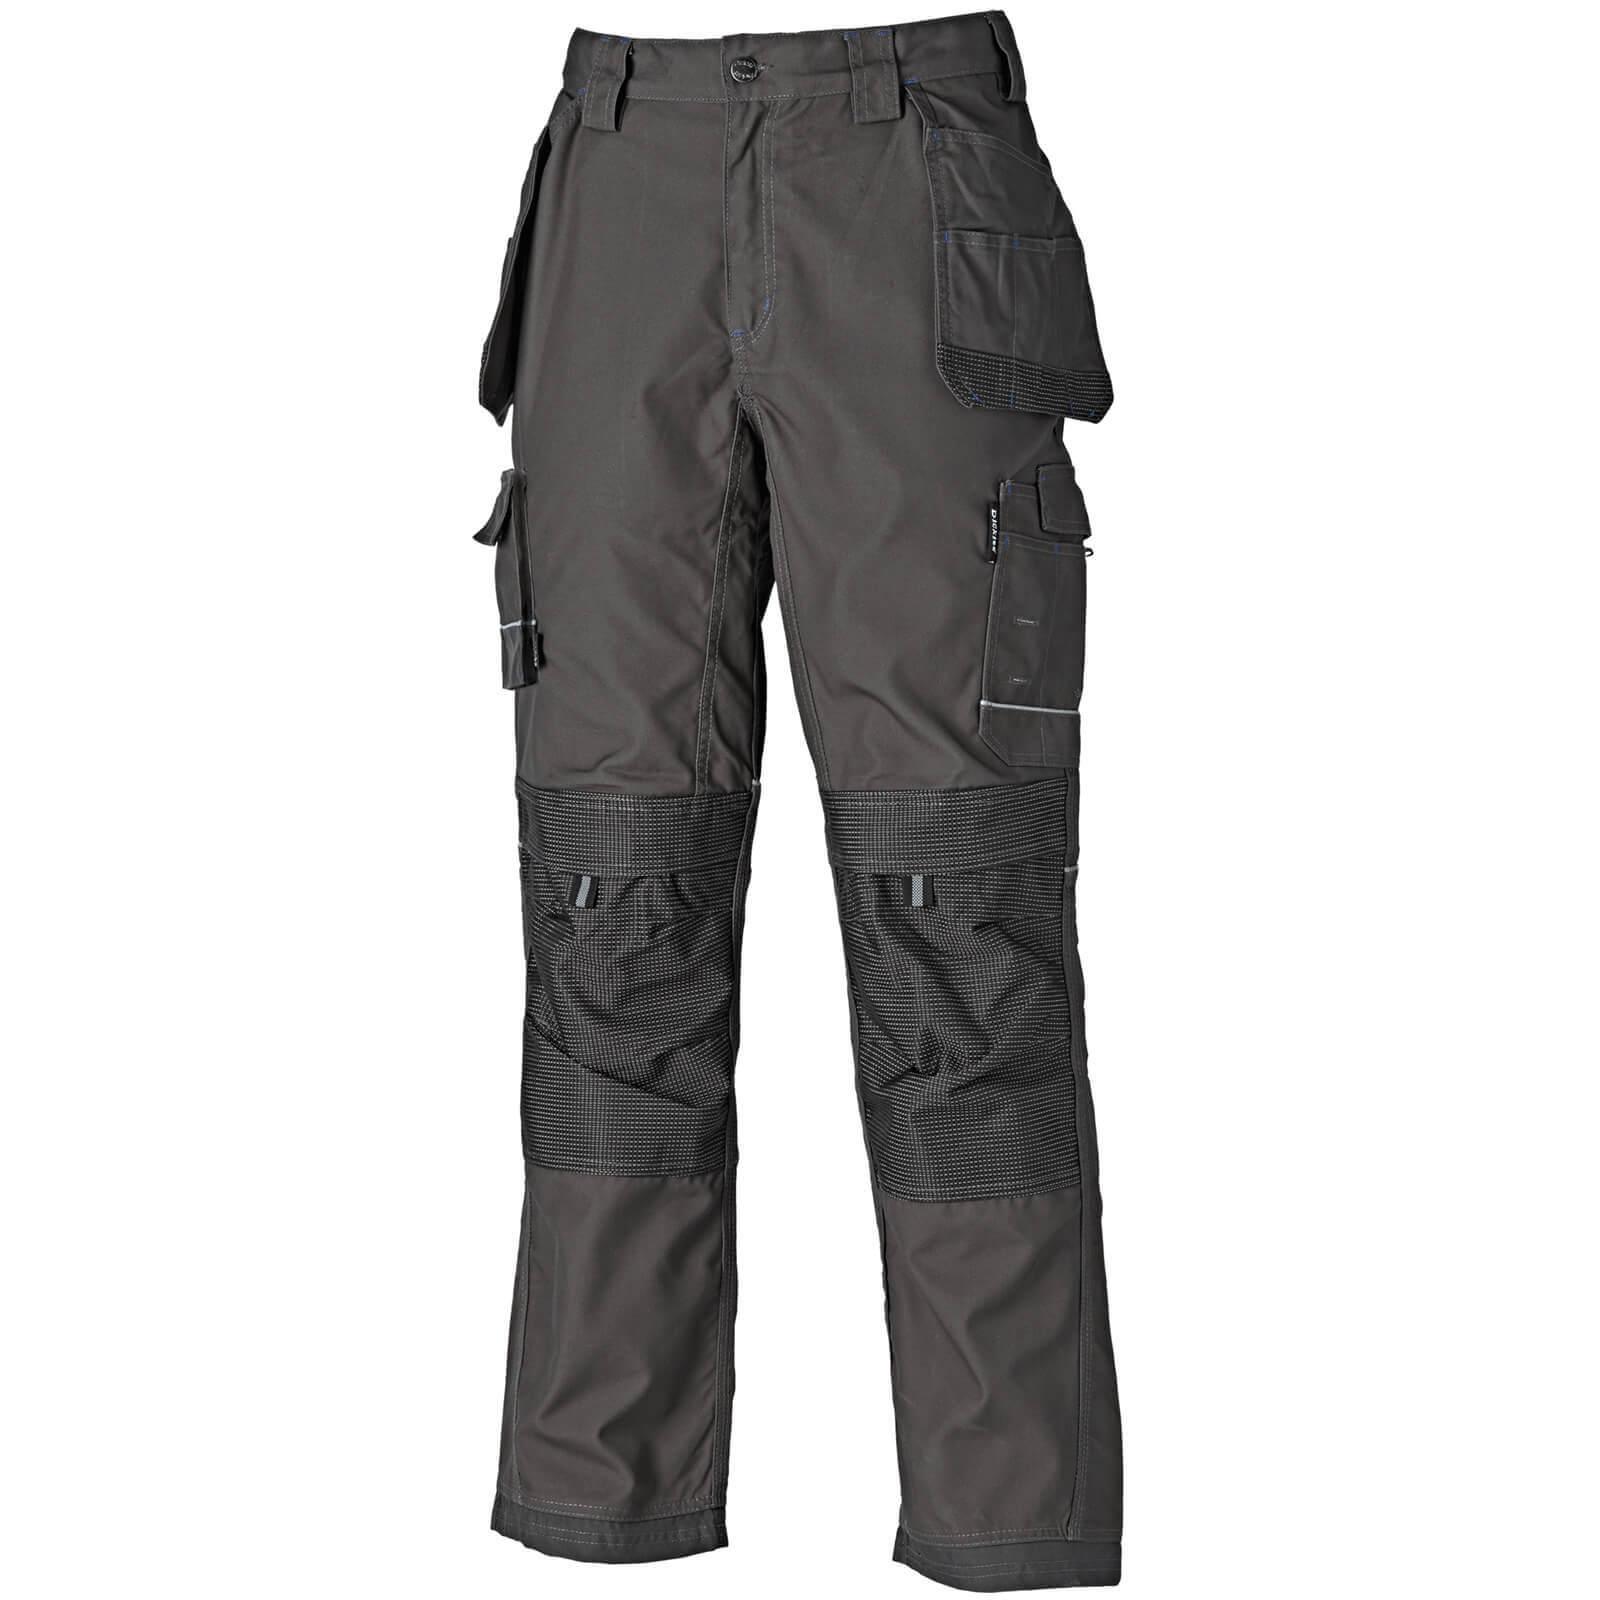 Photo of Dickies mens eisenhower max trousers grey 34